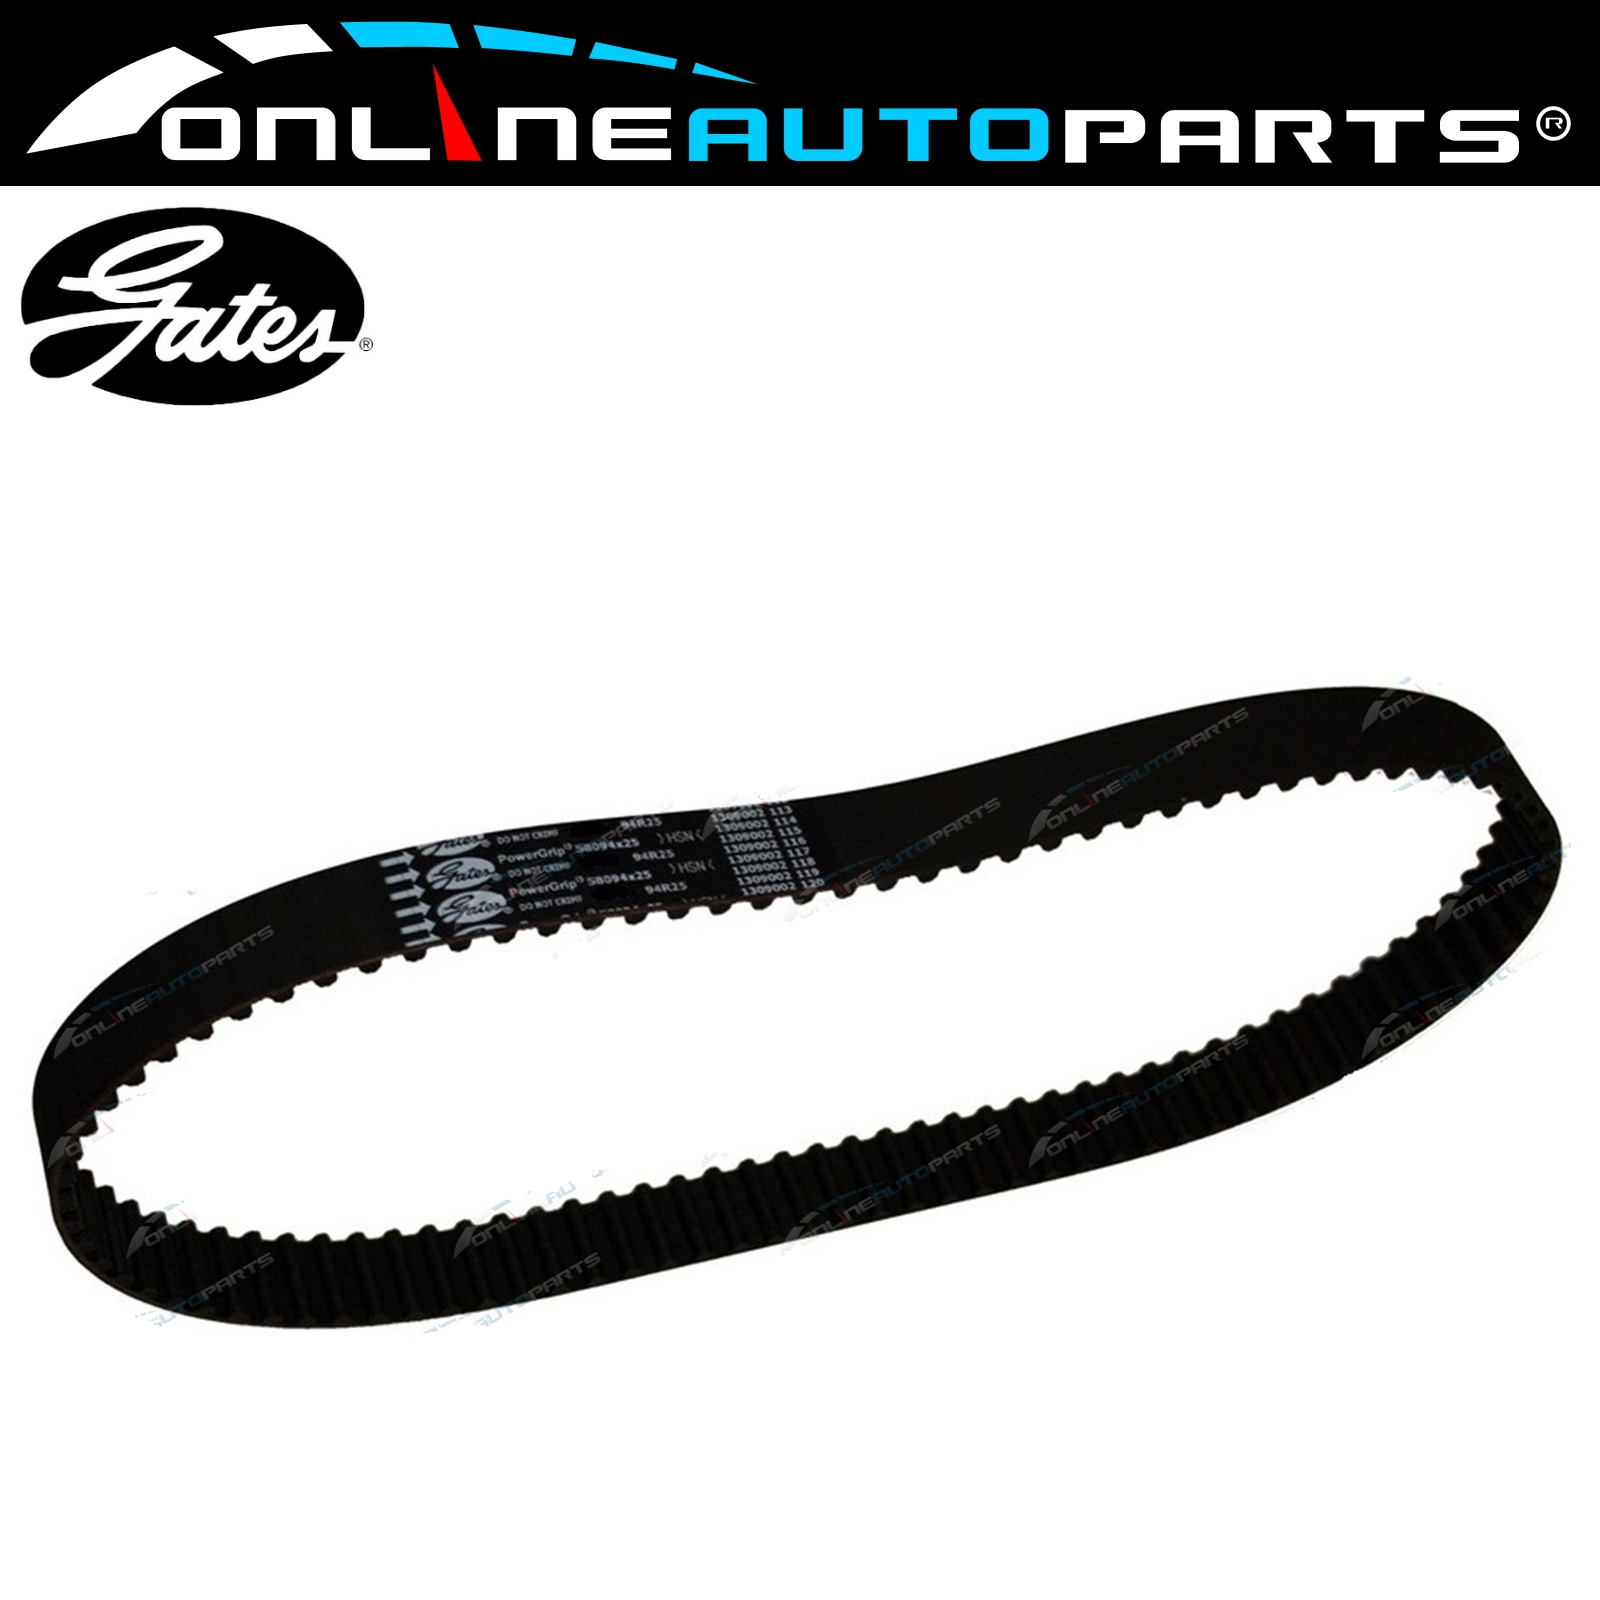 Gates Engine Timing Belt Suits Toyota Prado Vzj90 Vzj95 9602 V6 5vz Product Fe